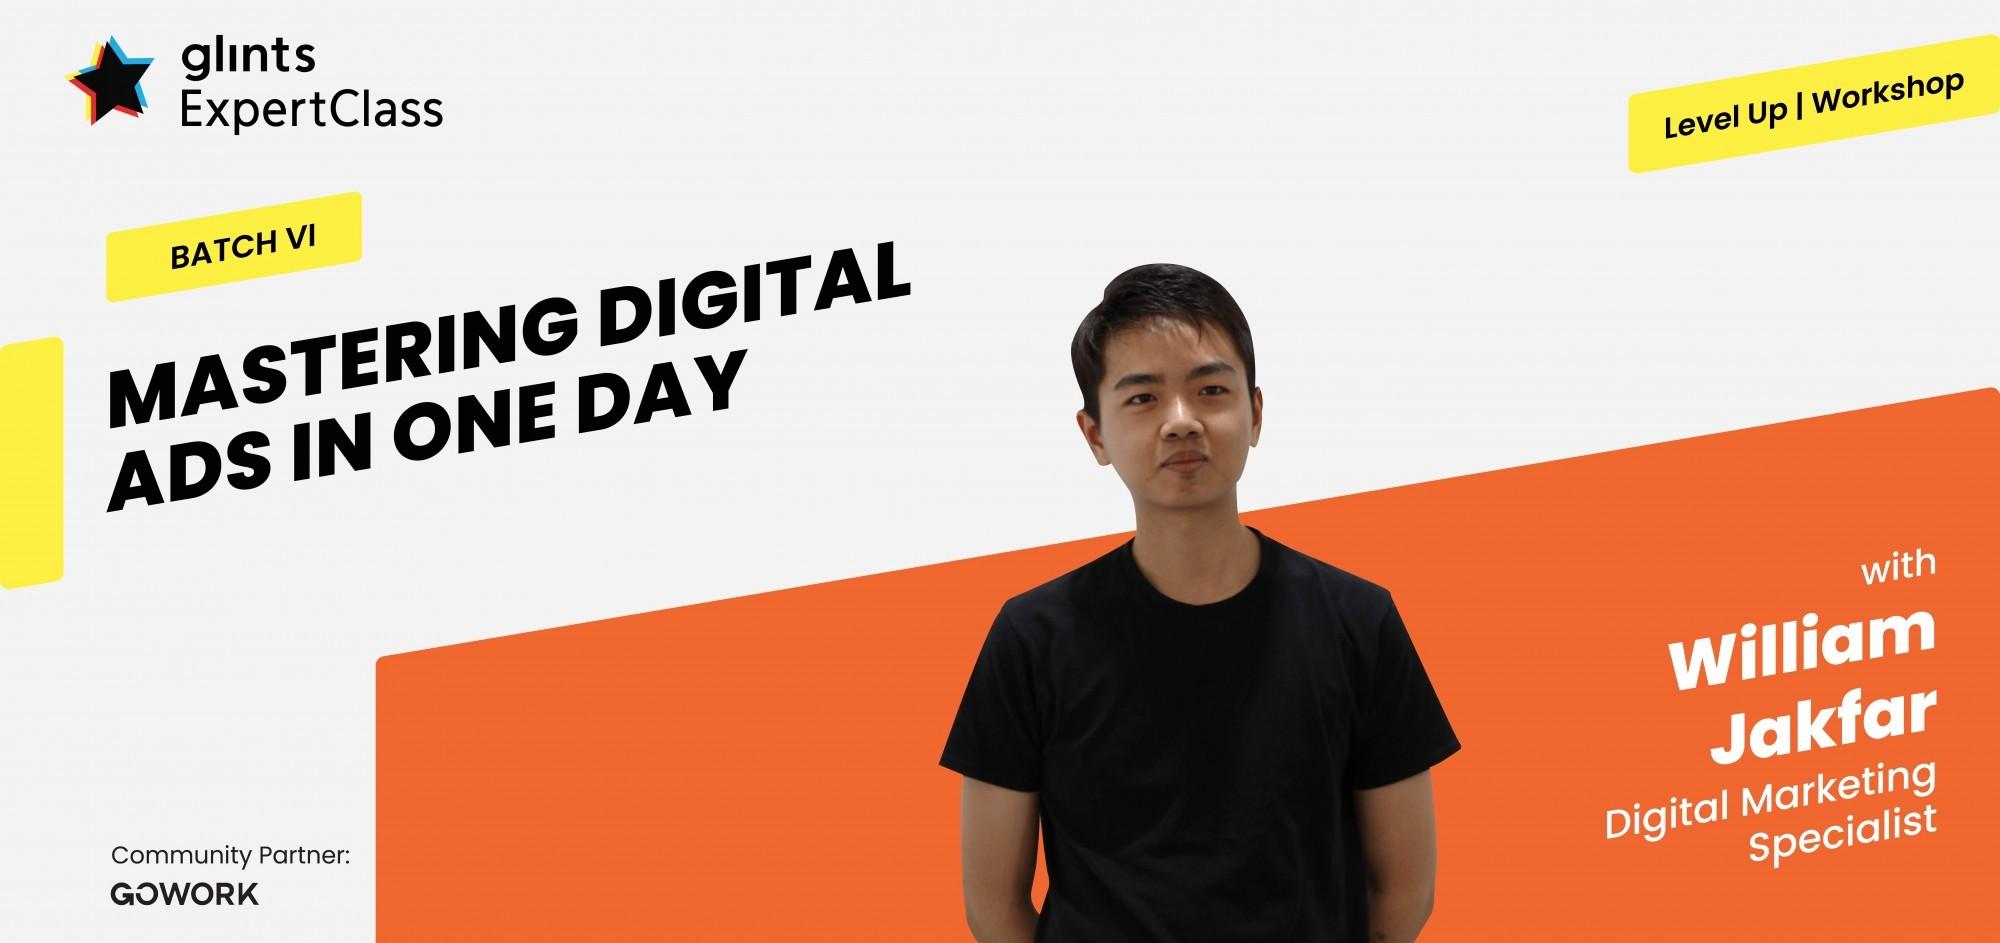 [Online Glints ExpertClass] Marketing Workshop : Mastering Digital Ads in One Day Batch VI